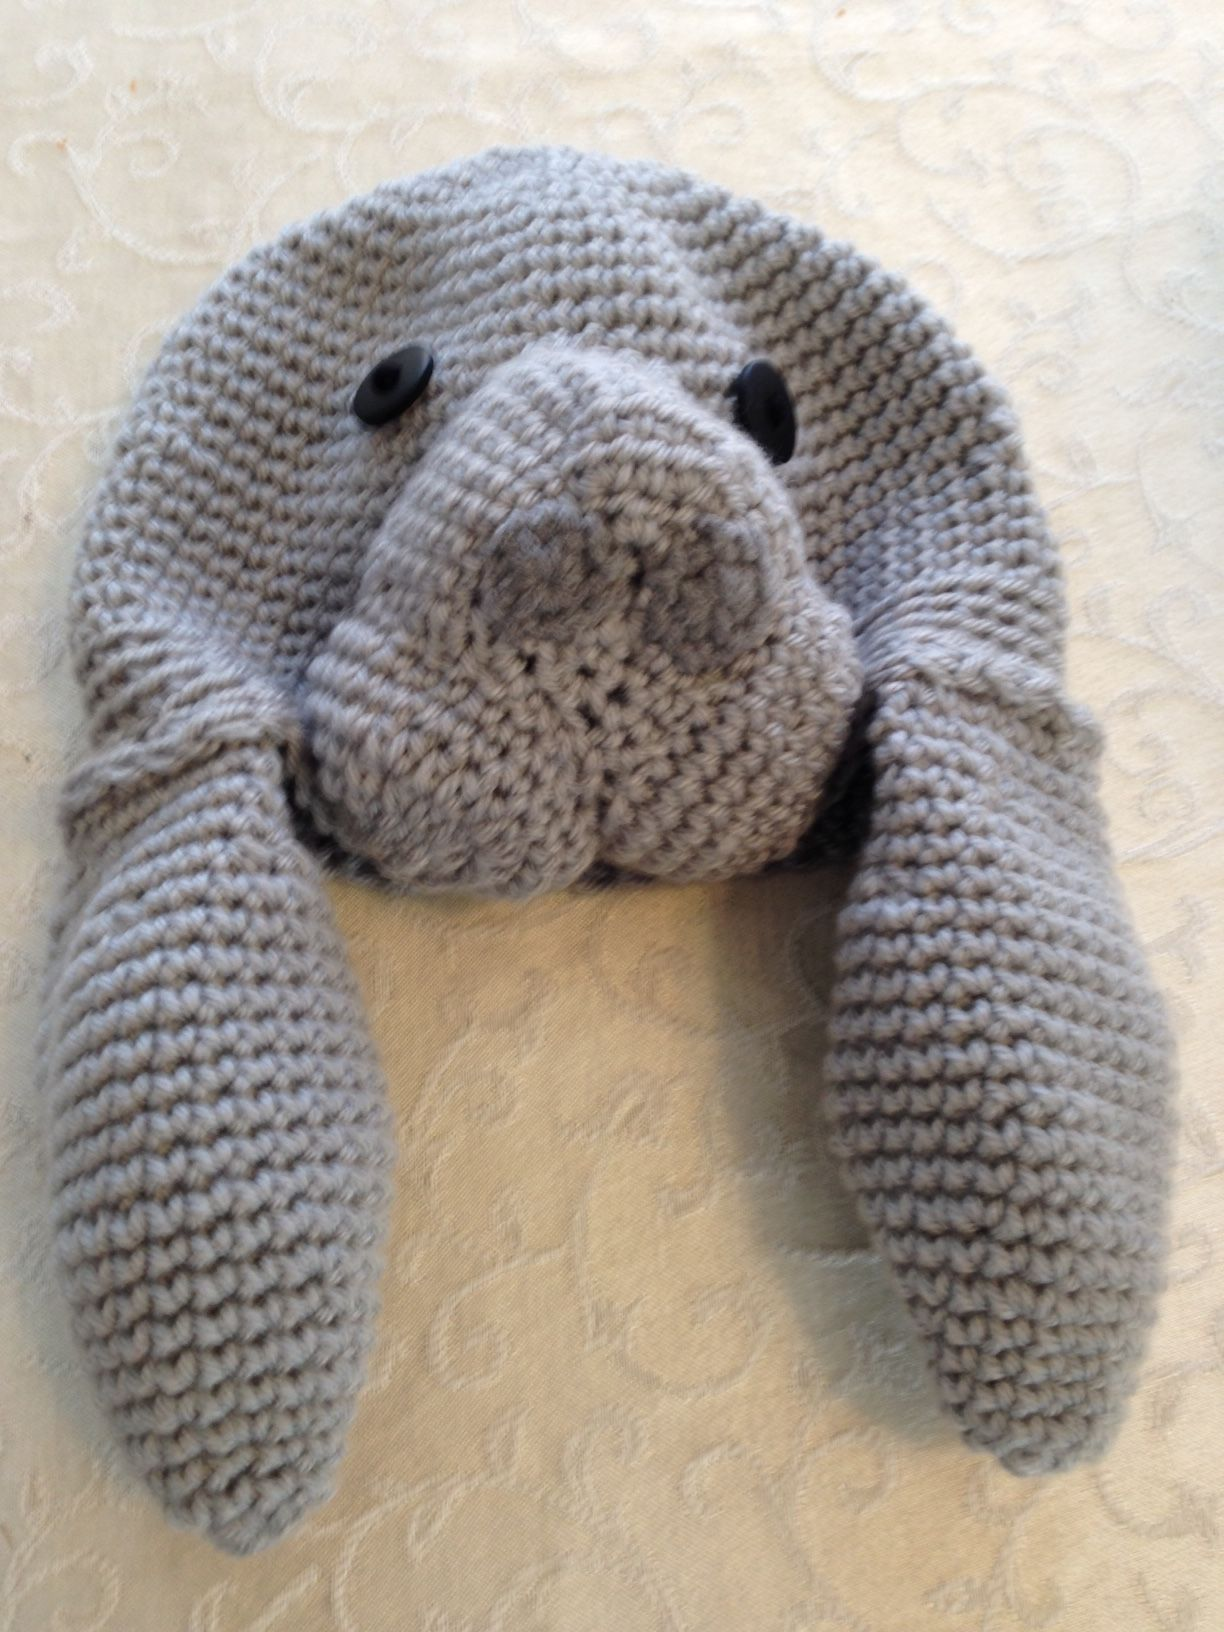 Crochet Manatee Hat | My Style | Pinterest | Manatee, Crochet and ...